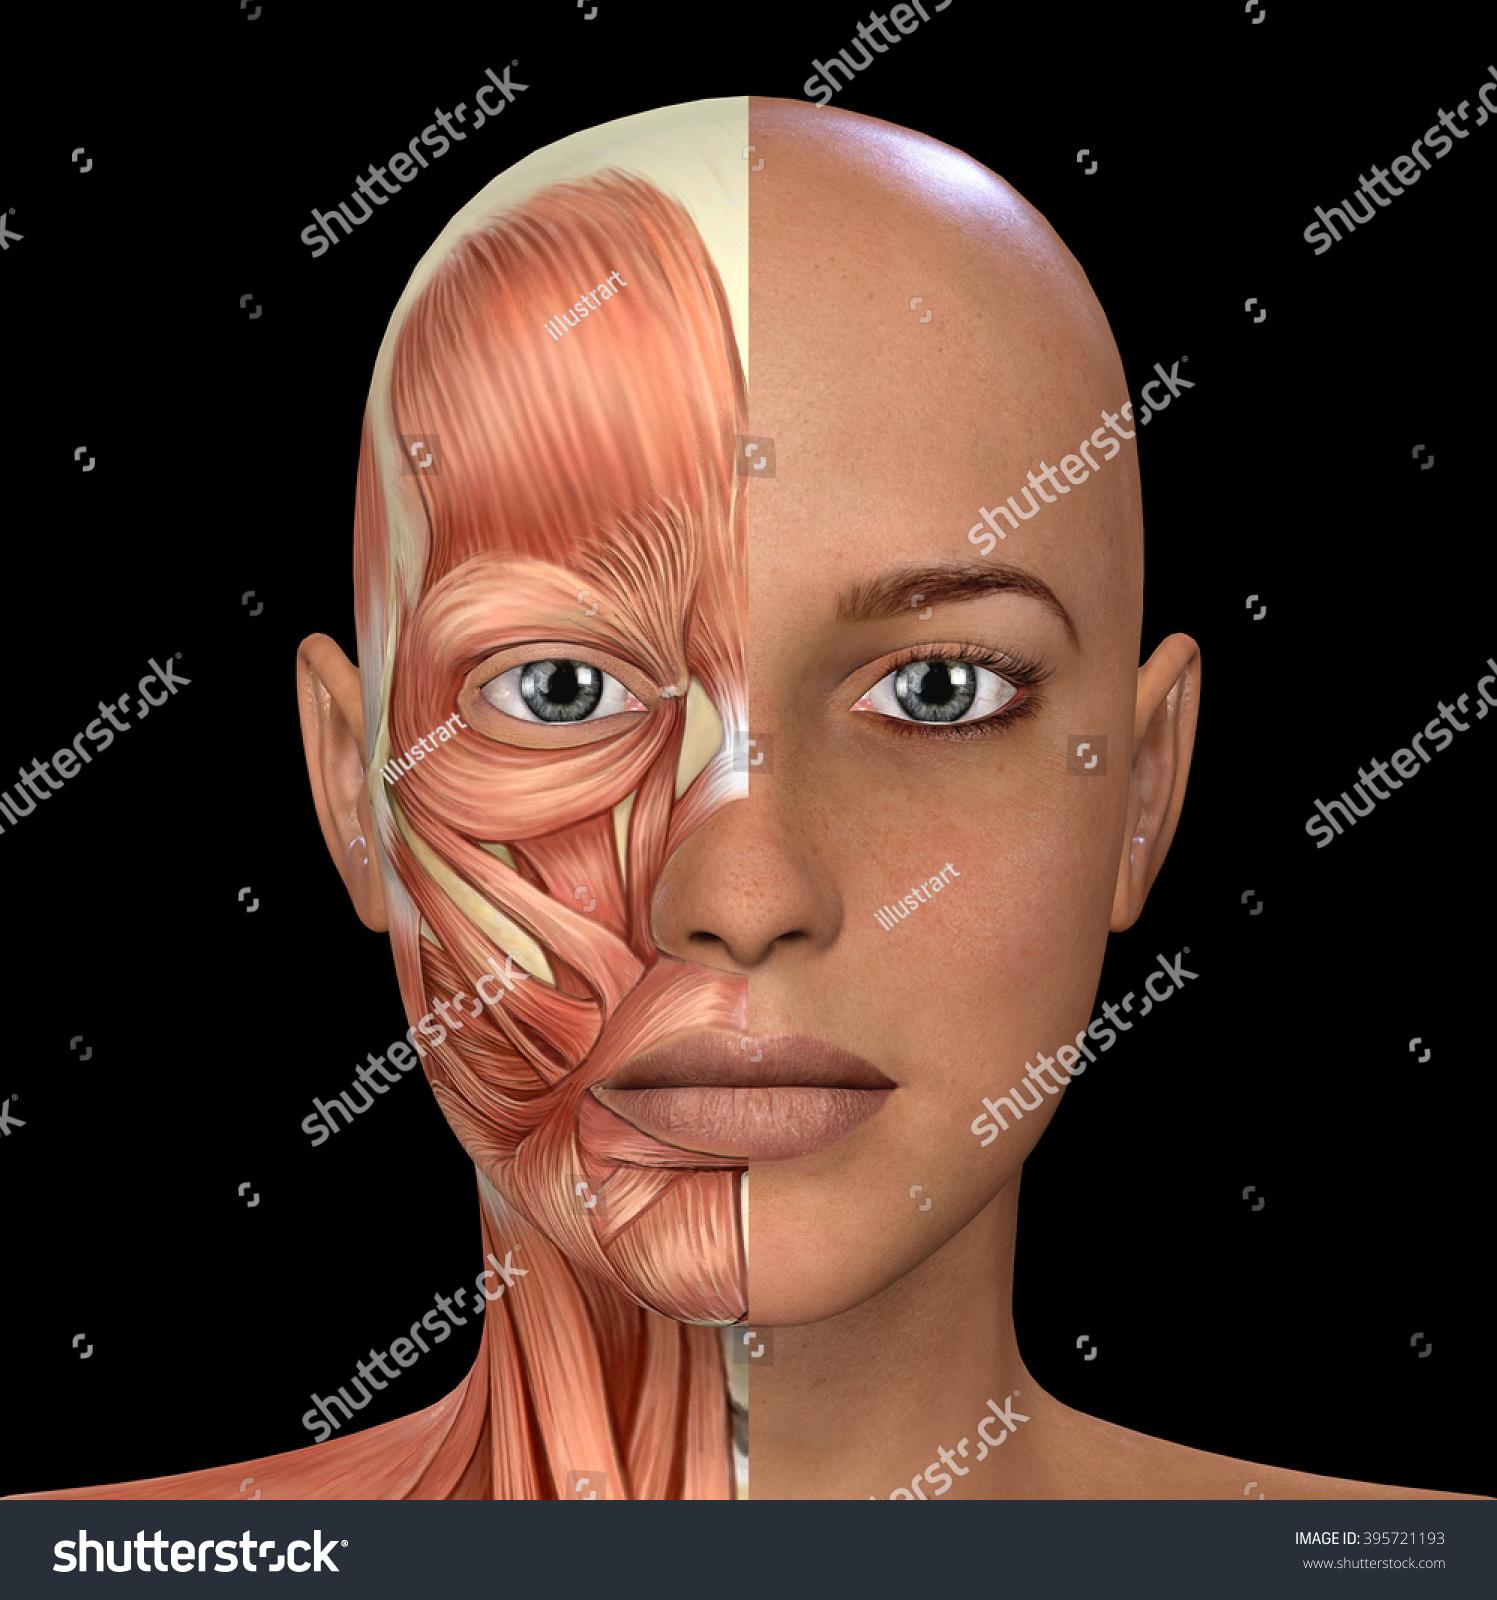 Female Face Muscles Anatomy Stock Illustration 395721193 - Shutterstock